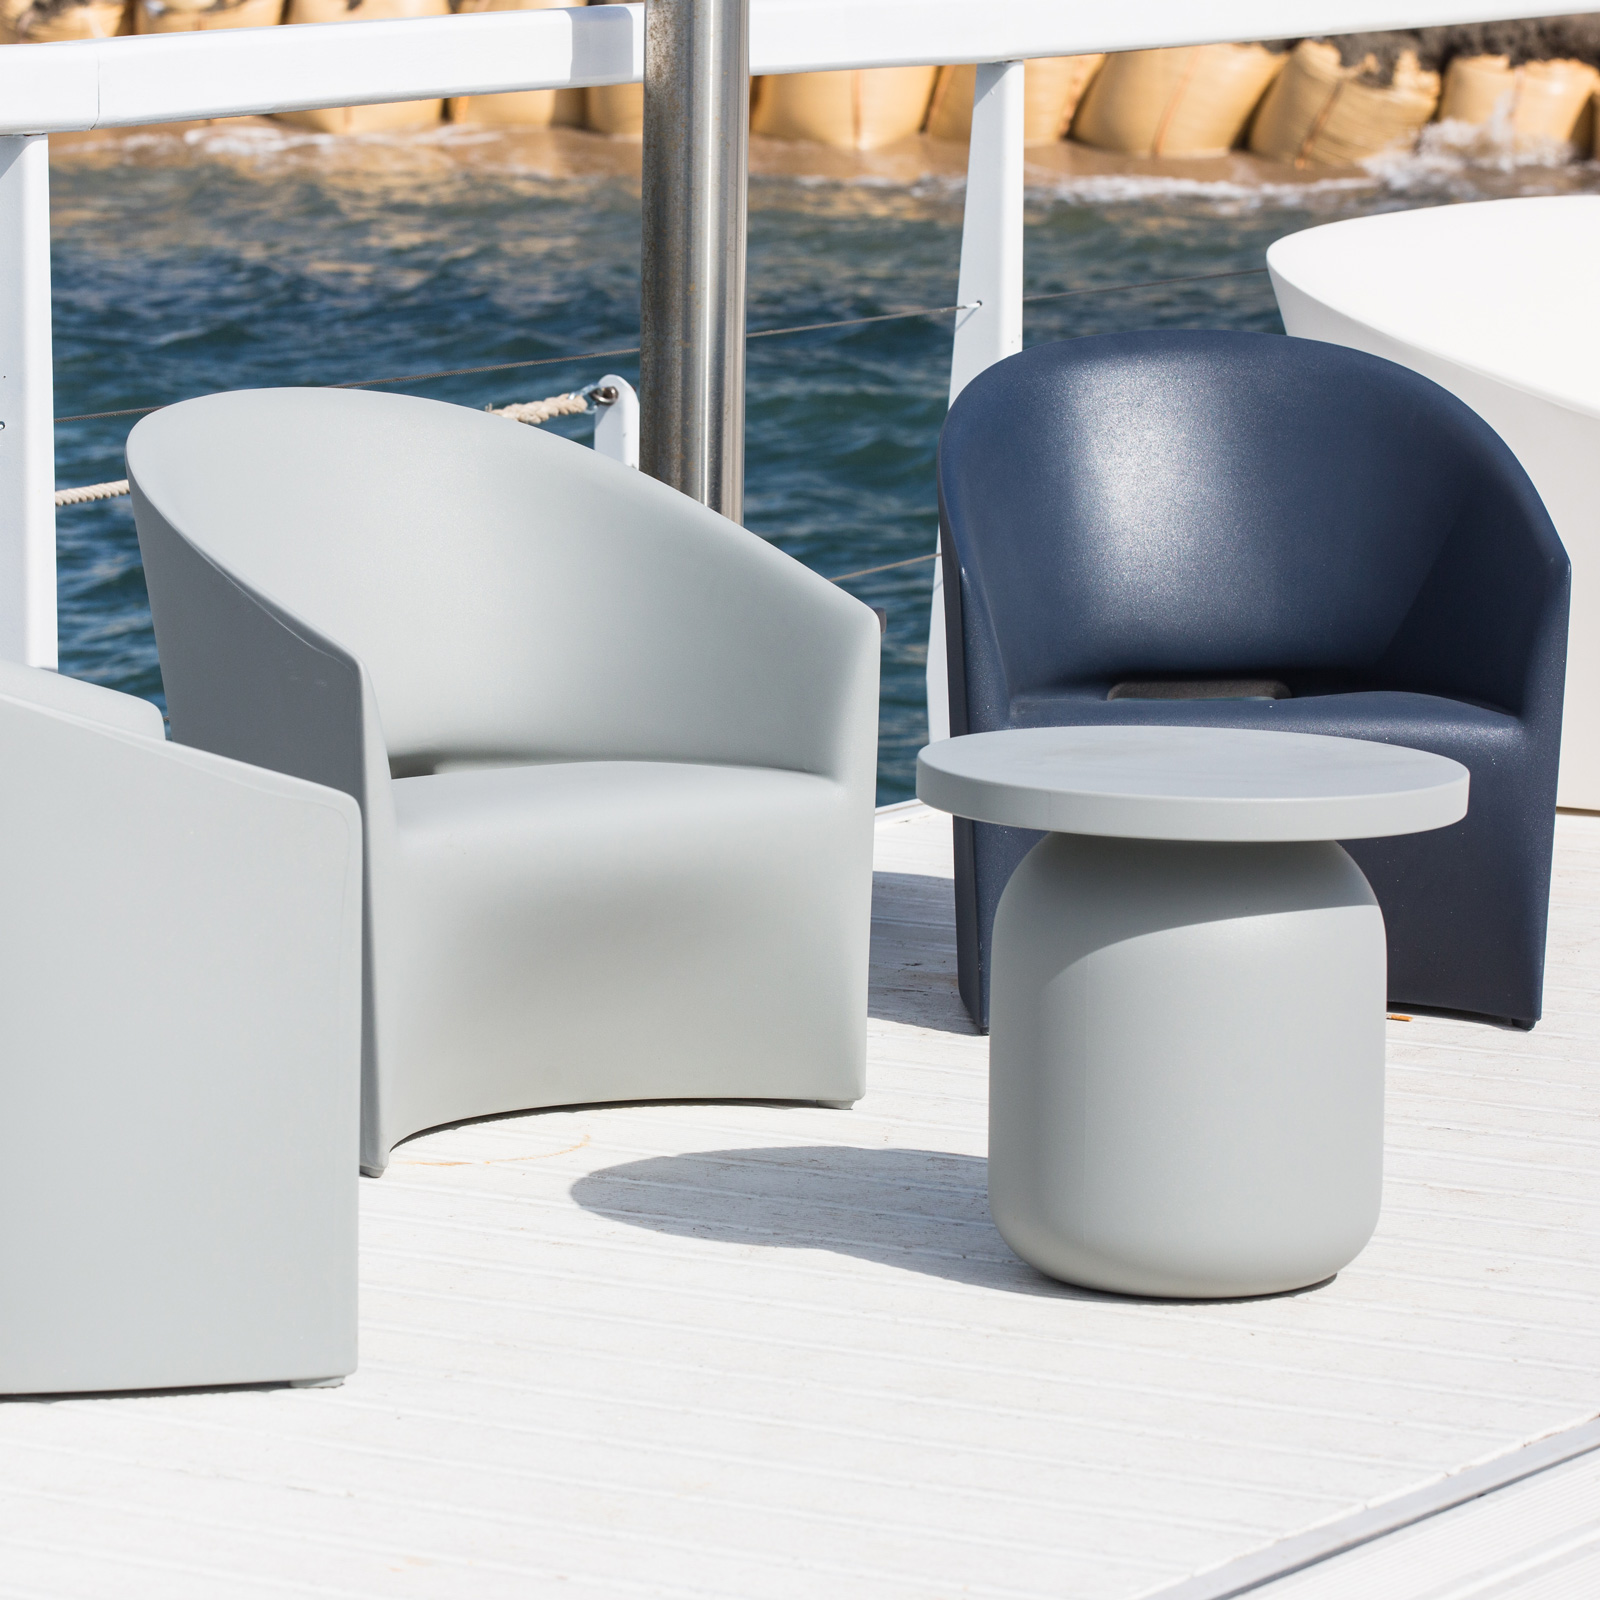 Pine beach armchair by serralunga core furniture online for Serralunga furniture